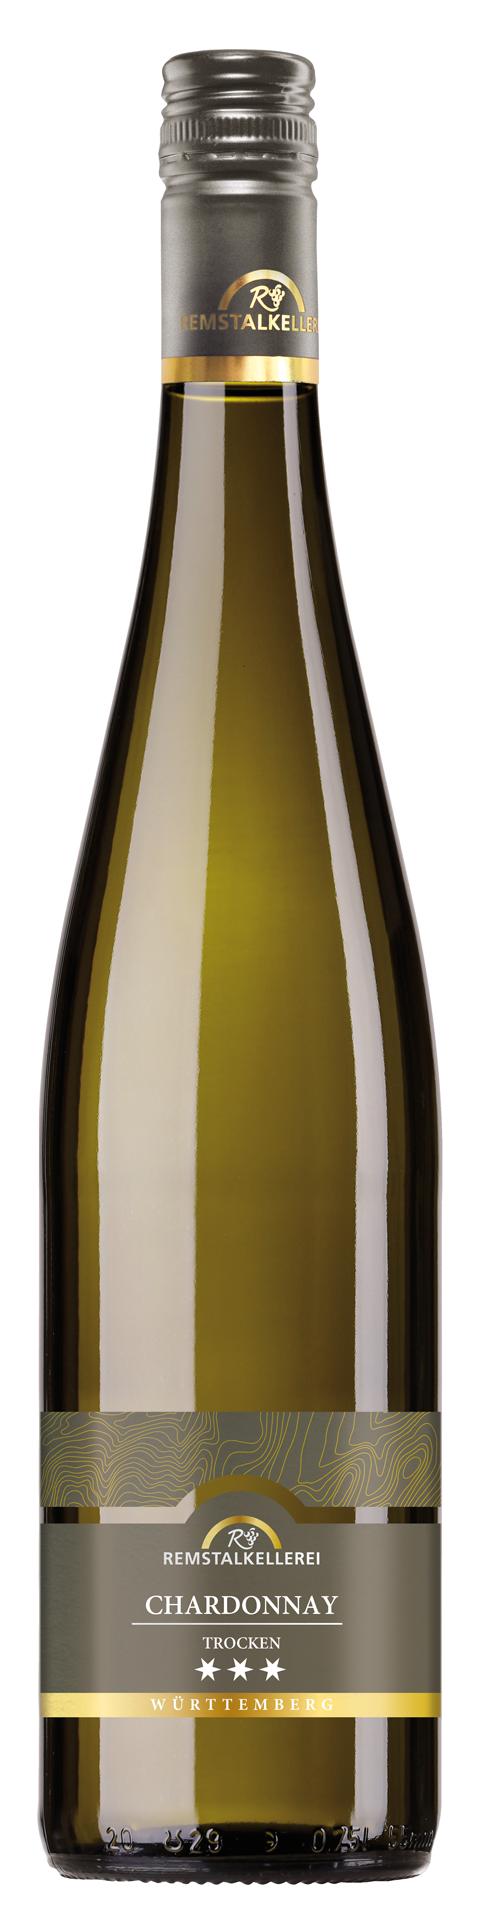 Chardonnay *** trocken